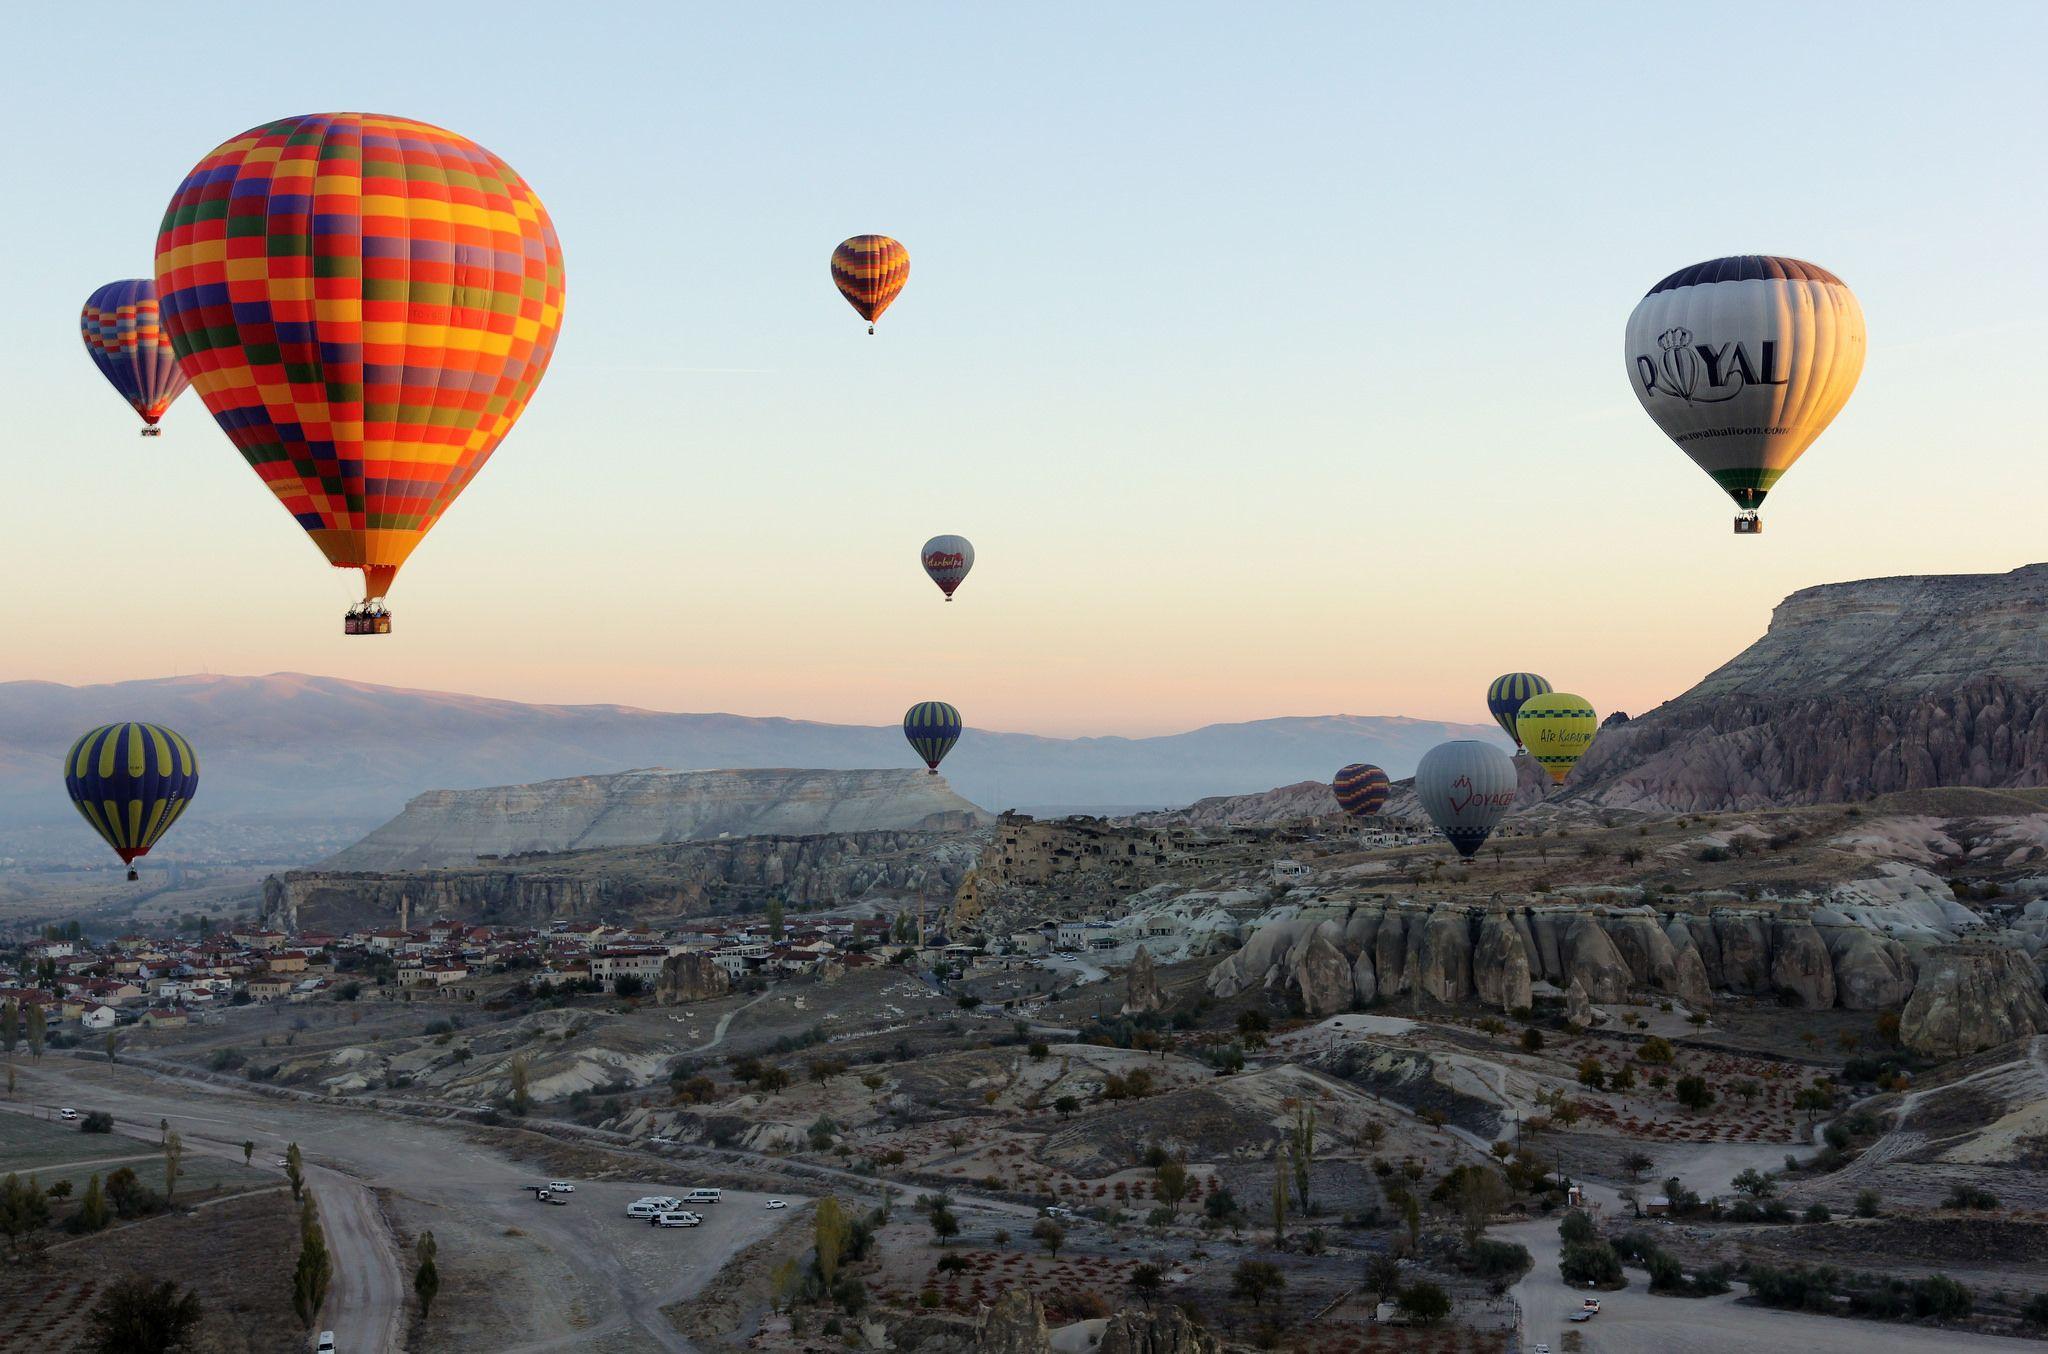 Cappadocia Hot Air Balloons (With images) Air balloon